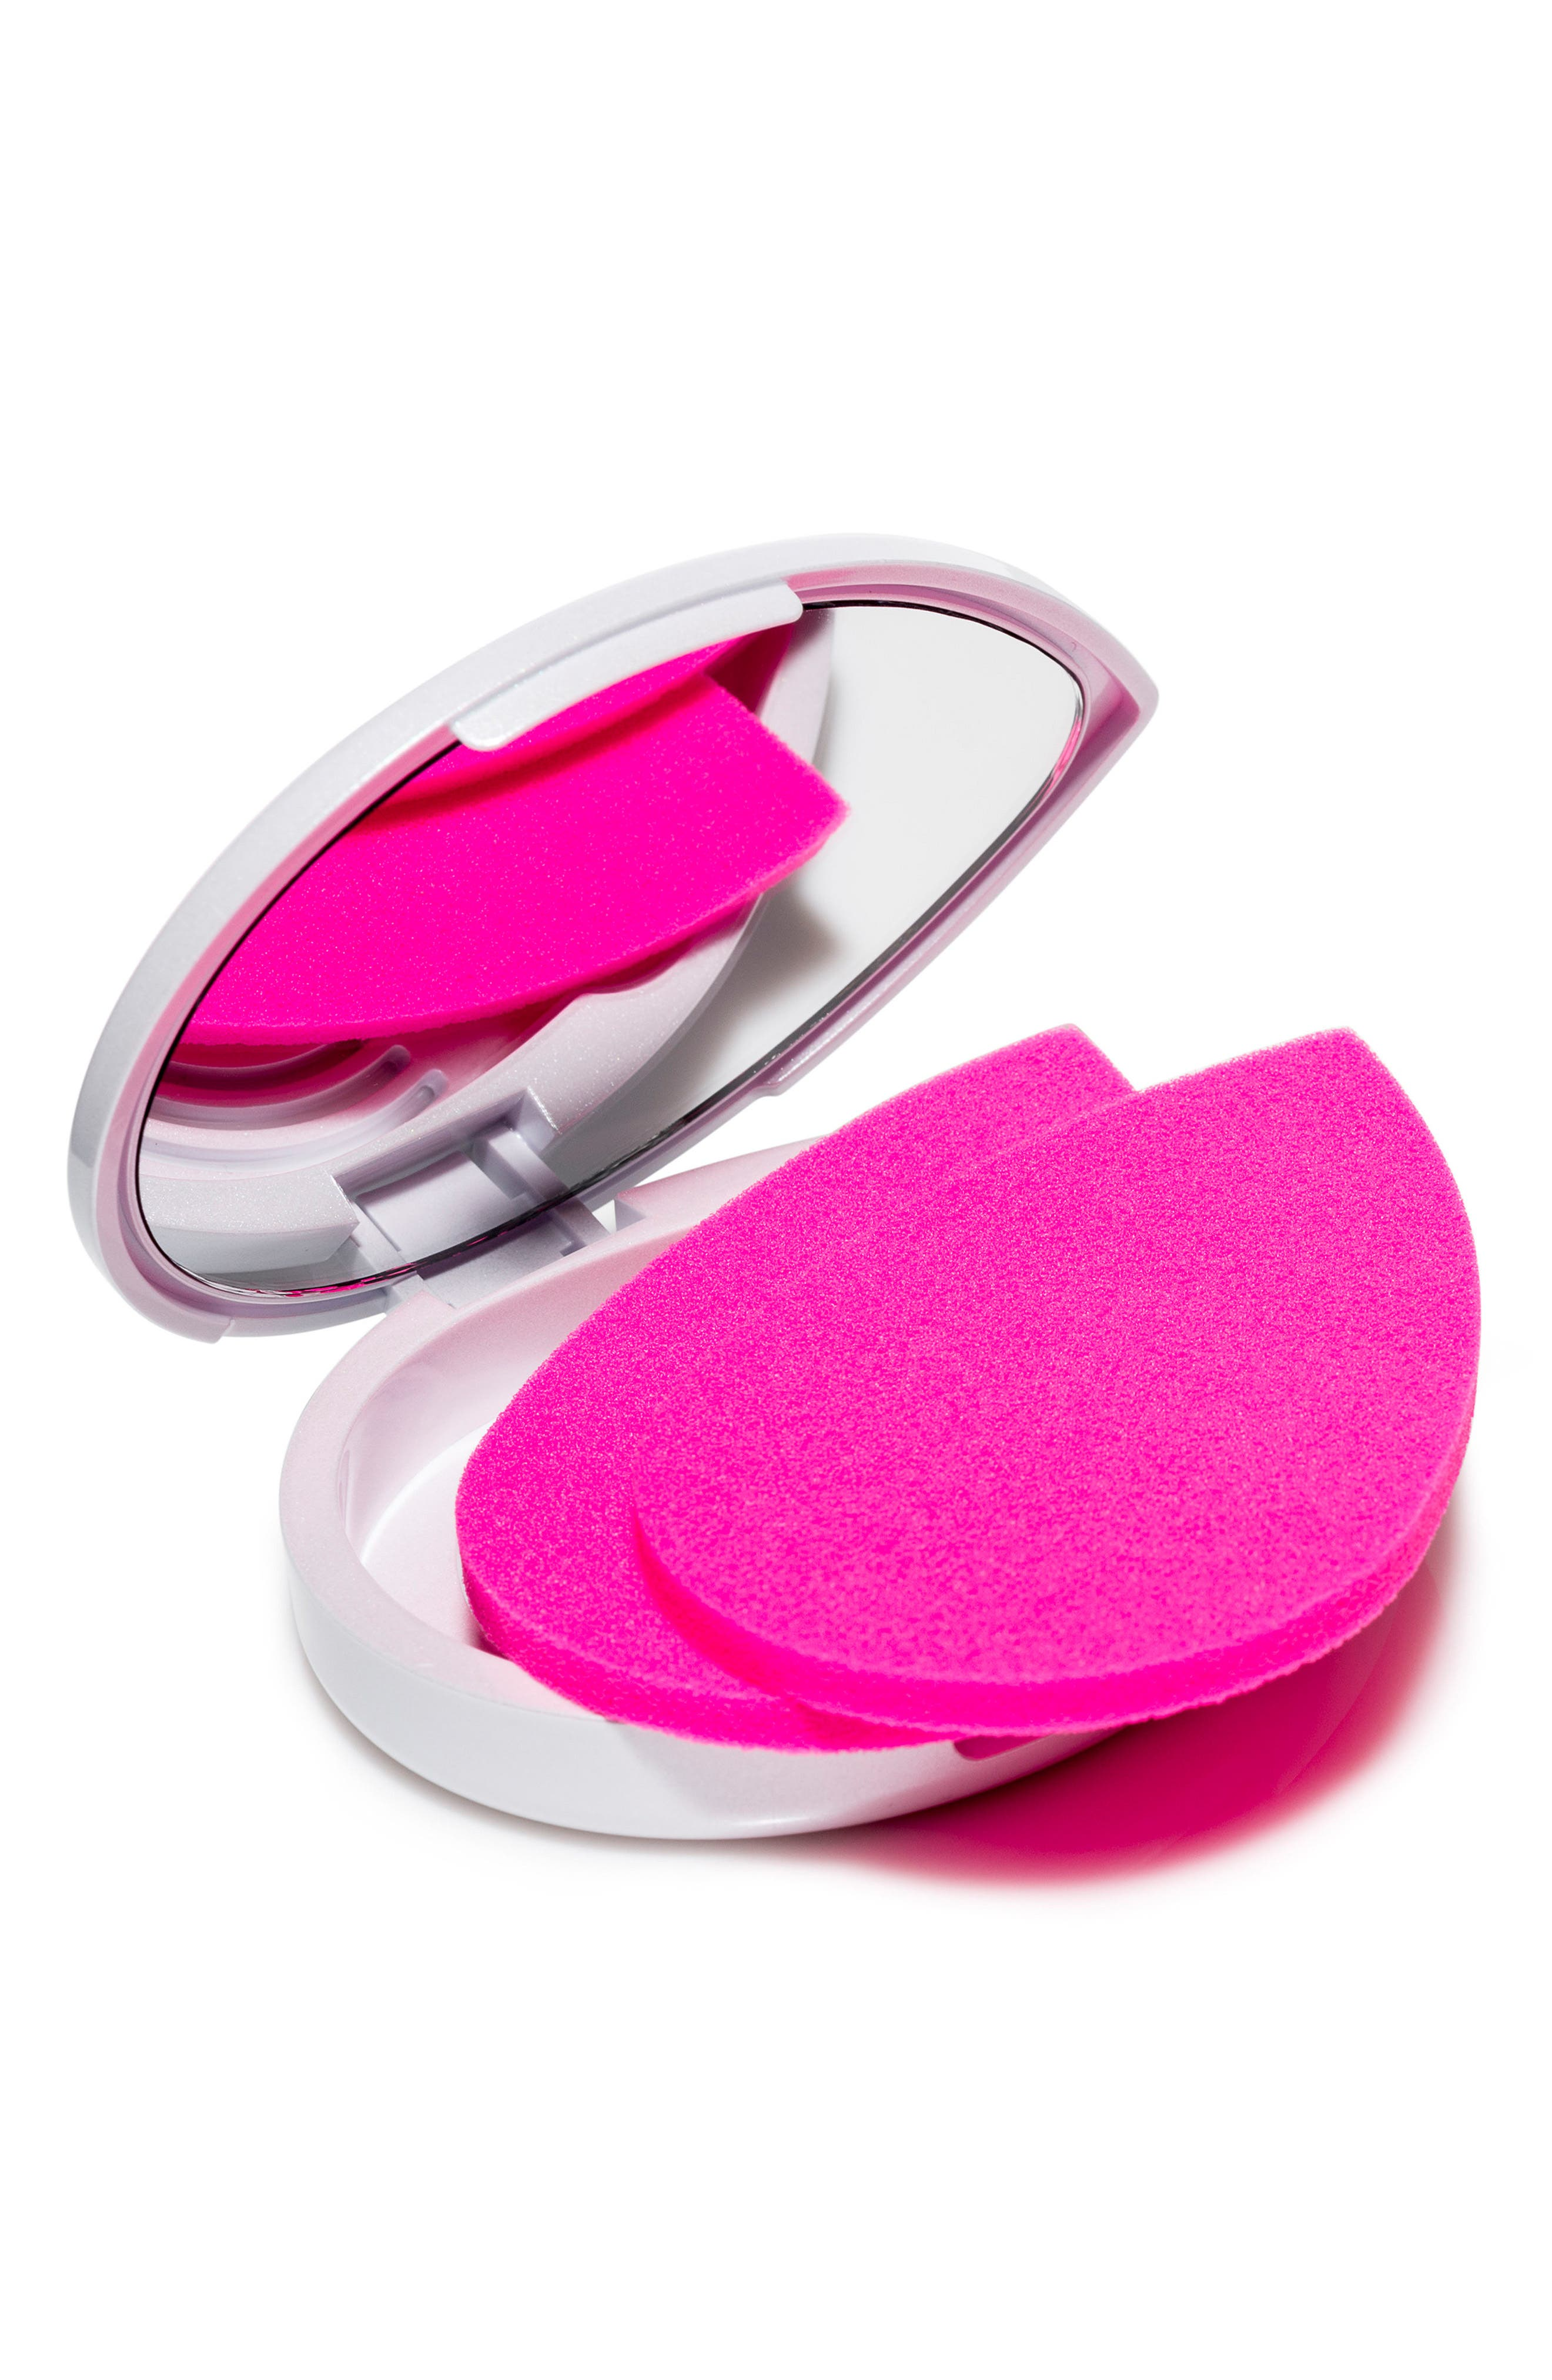 beautyblender® blotterazzi Blotting Sponges & Compact